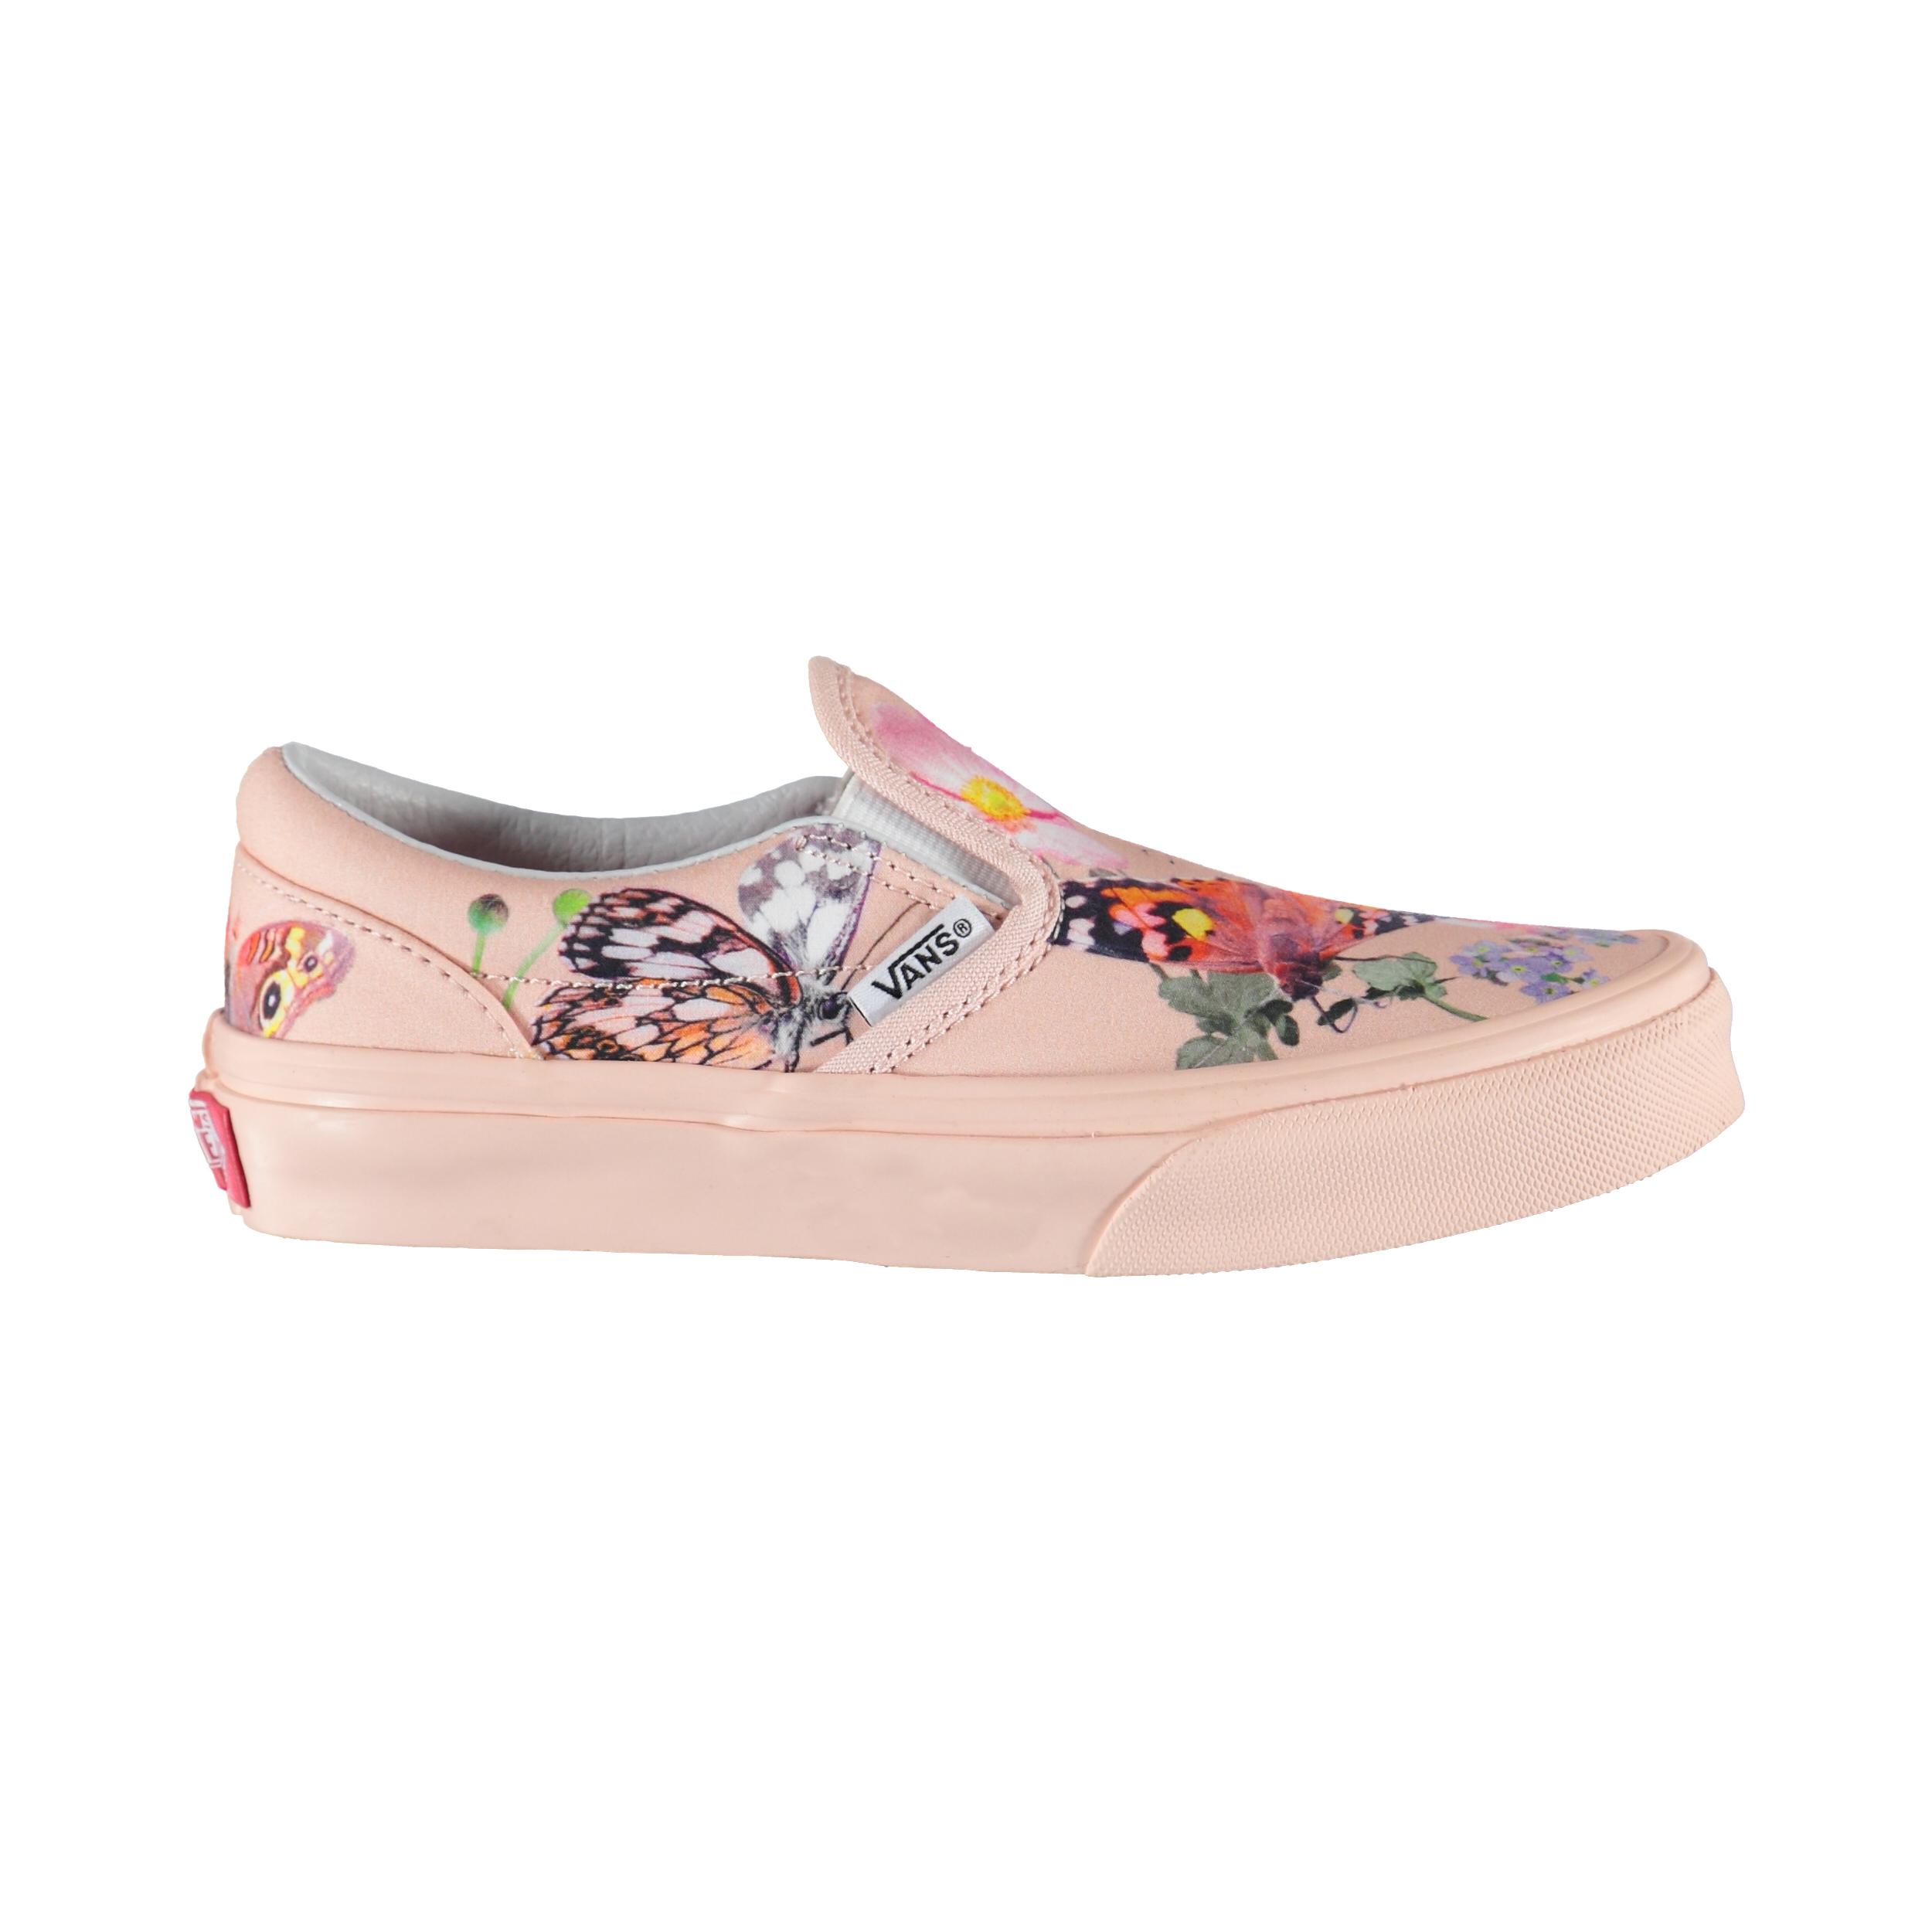 Vans x Molo 5 Kids Slip On Pink